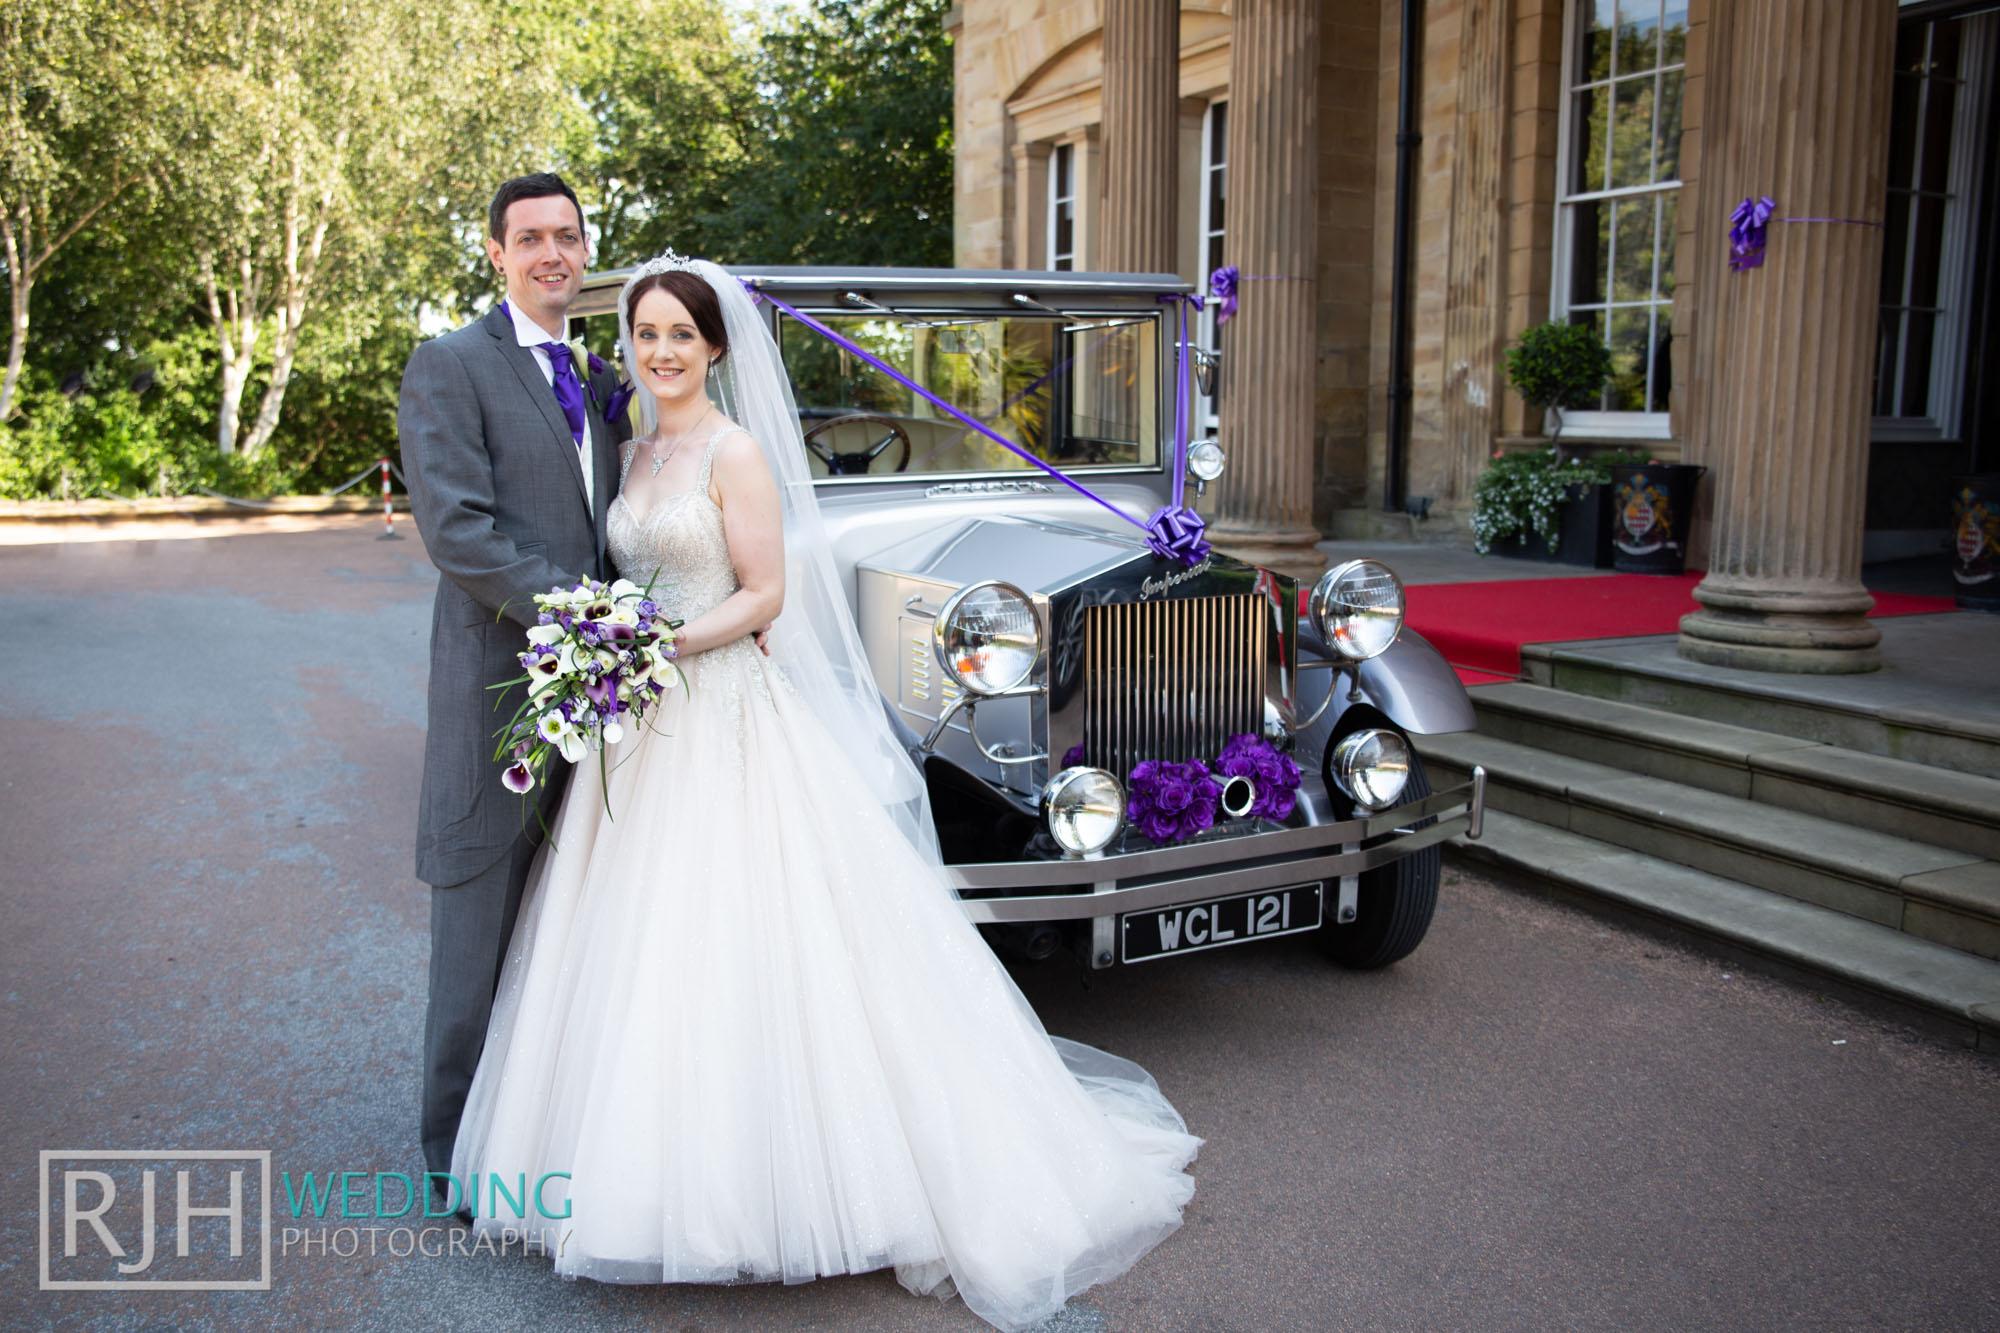 Oulton Hall Wedding Photography_Goodwill-Hall_030_IMG_6638.jpg